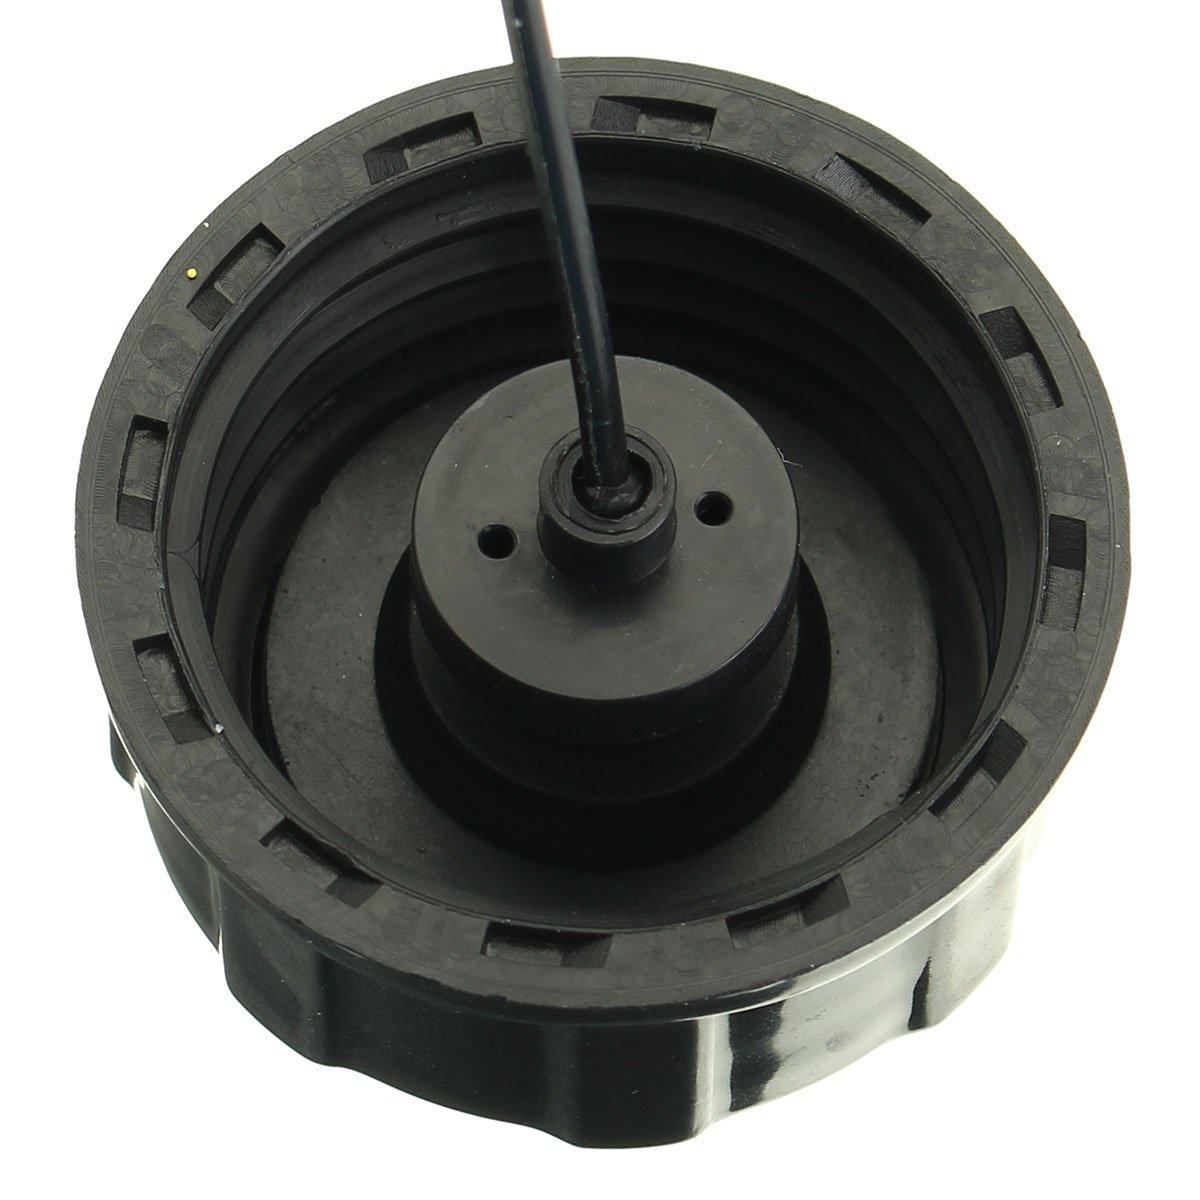 Alamor Fuel Tank Cap For HONDA GX22 GX25 GX31 GX35 Strimmer Engine Motor Parts 4.5cm